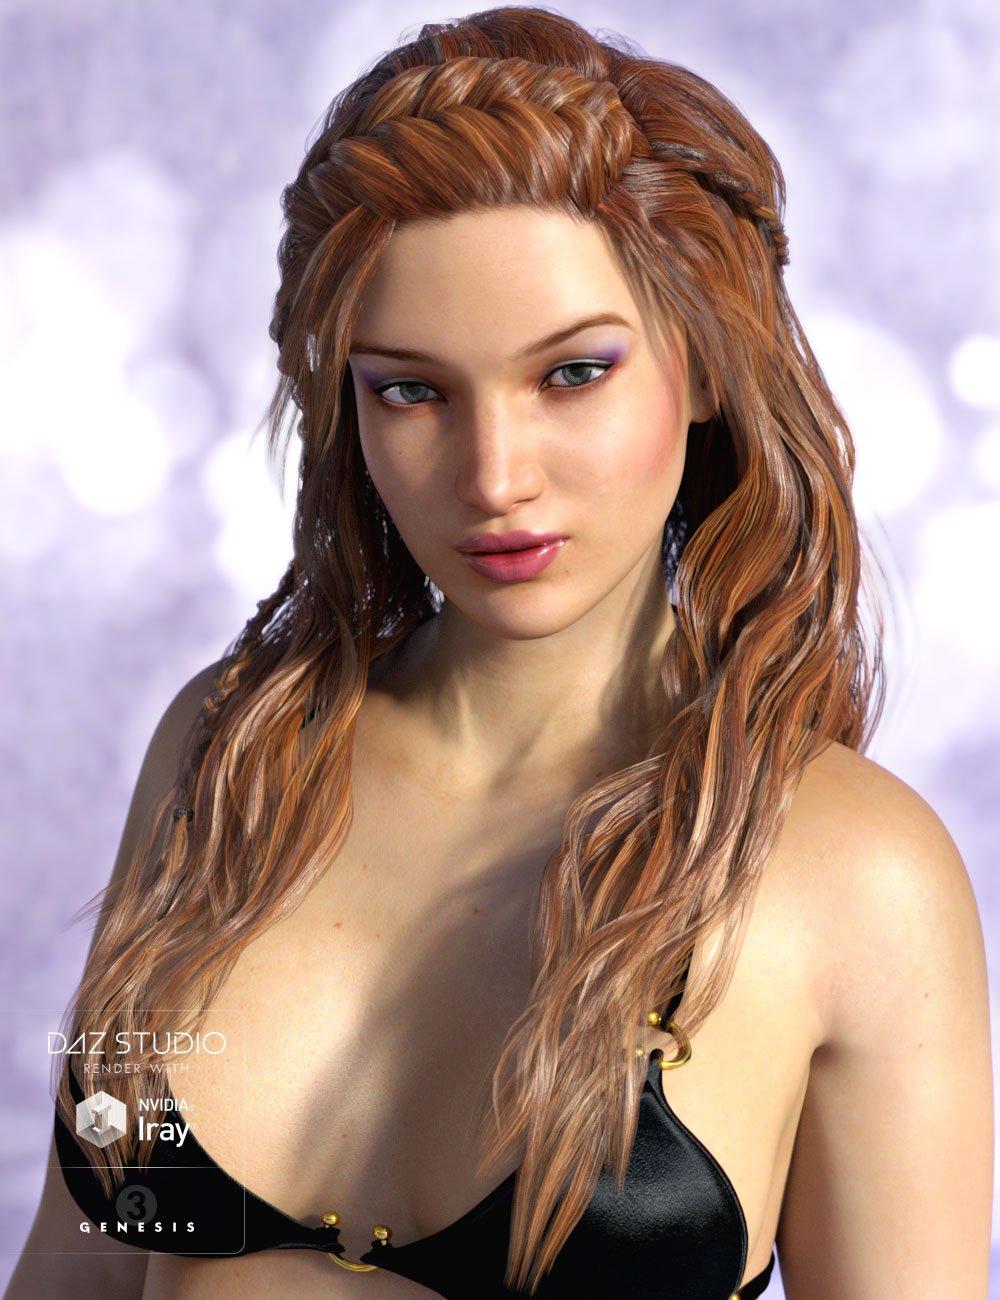 Sienna Hair for Genesis 3 Female(s) and Genesis 2 Female(s) by: AprilYSH, 3D Models by Daz 3D